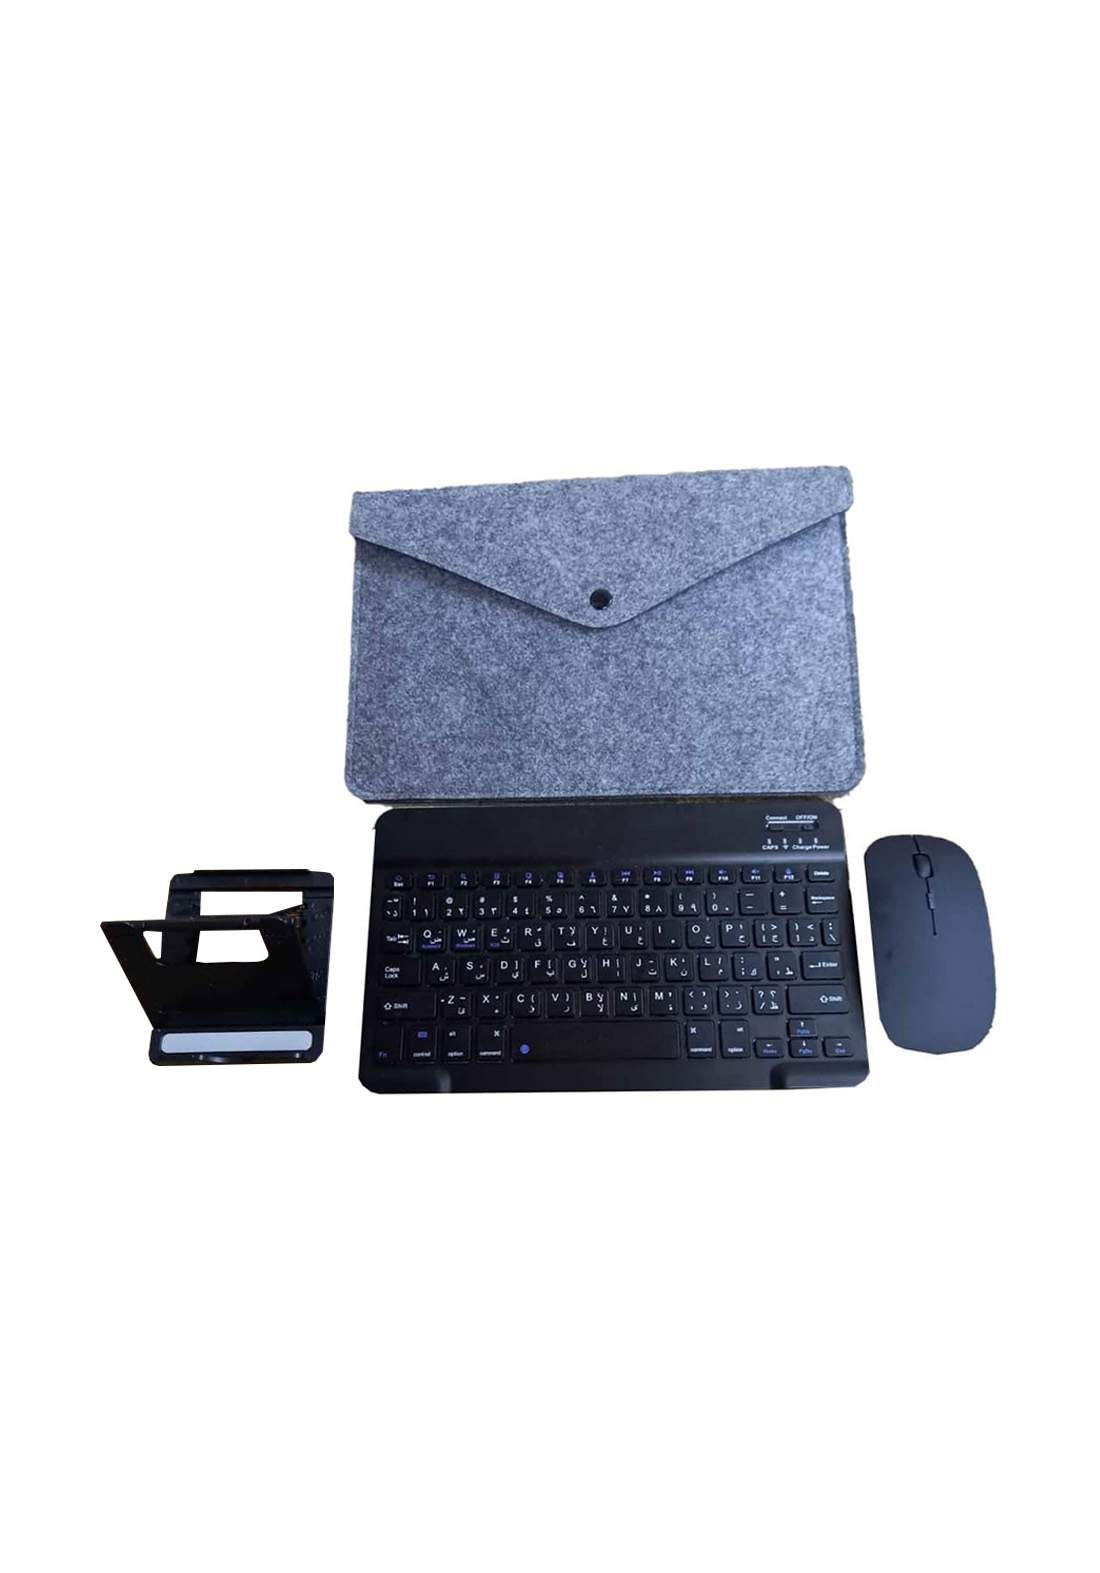 Set of  Wireless Keyboard Mouse Mobile Holder and Bag - Black سيت كيبورد وماوس لا سلكي